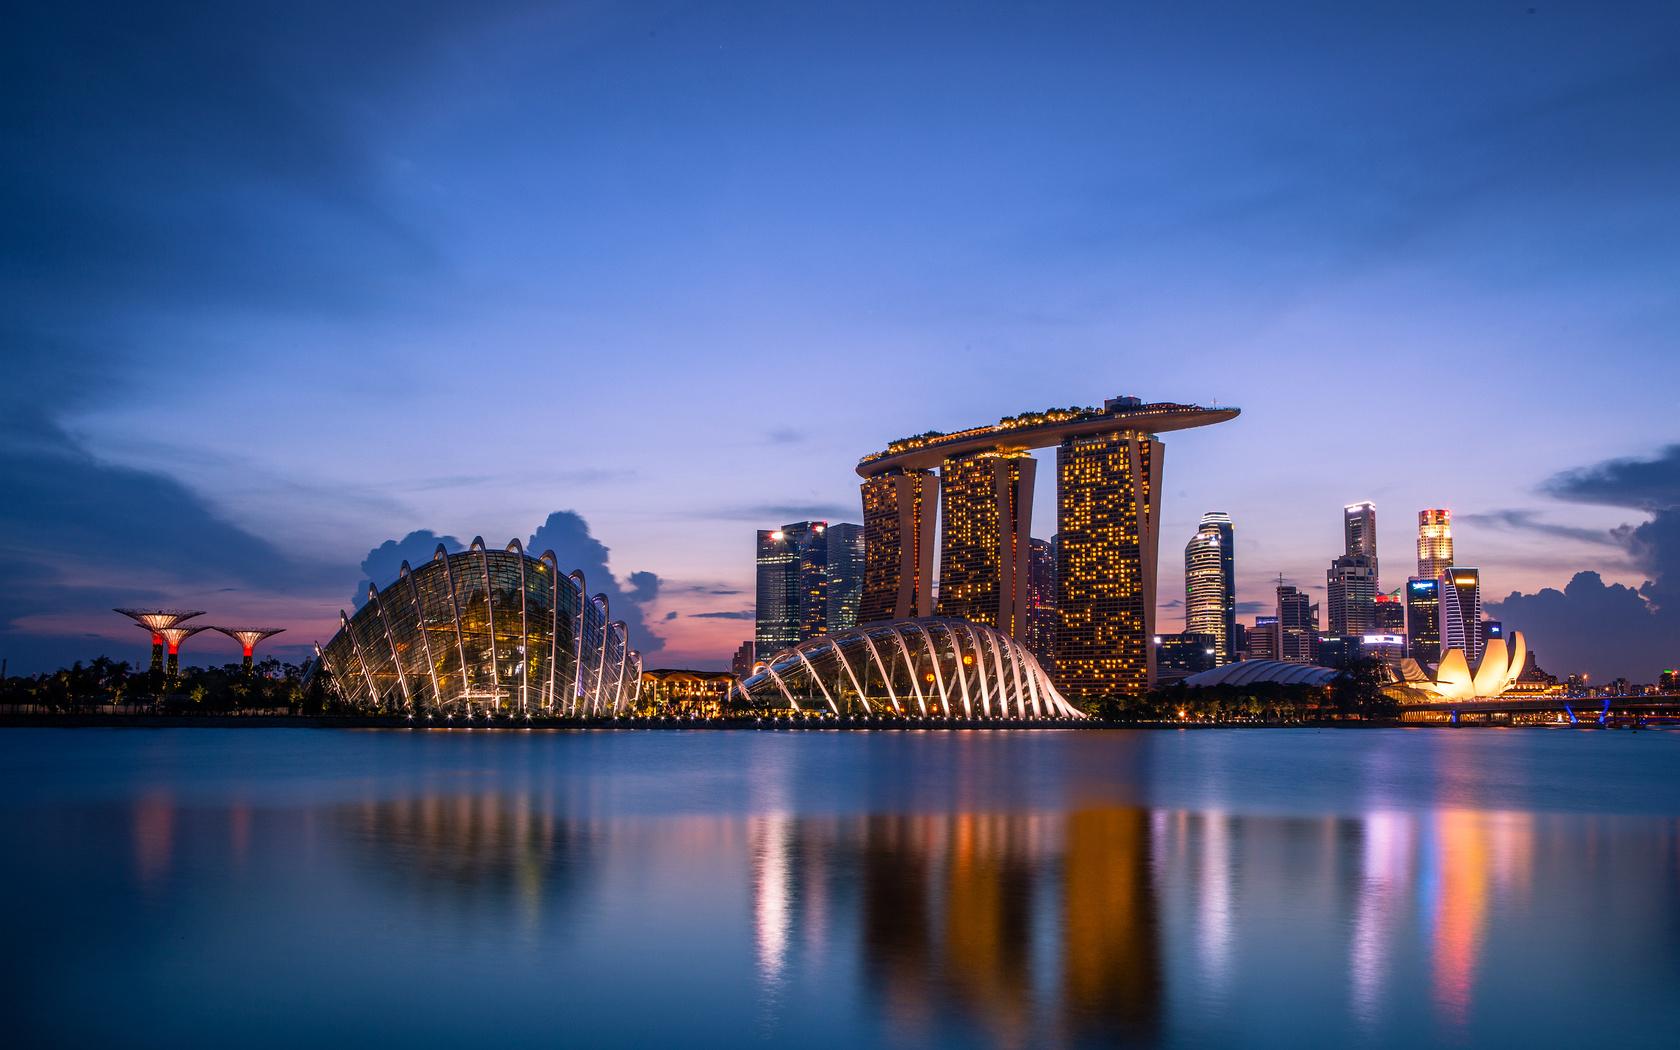 marina bay sands, архитектура, singapore, вечер, город